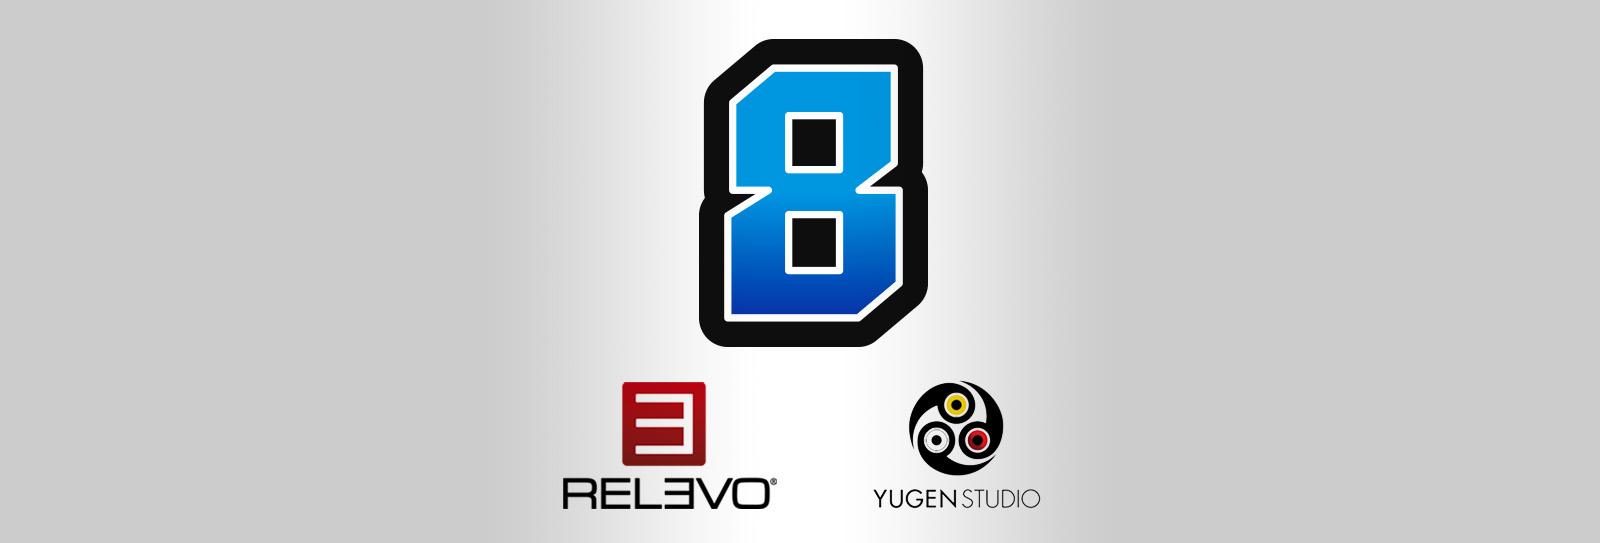 project8_relevo_yugenstudio_banner